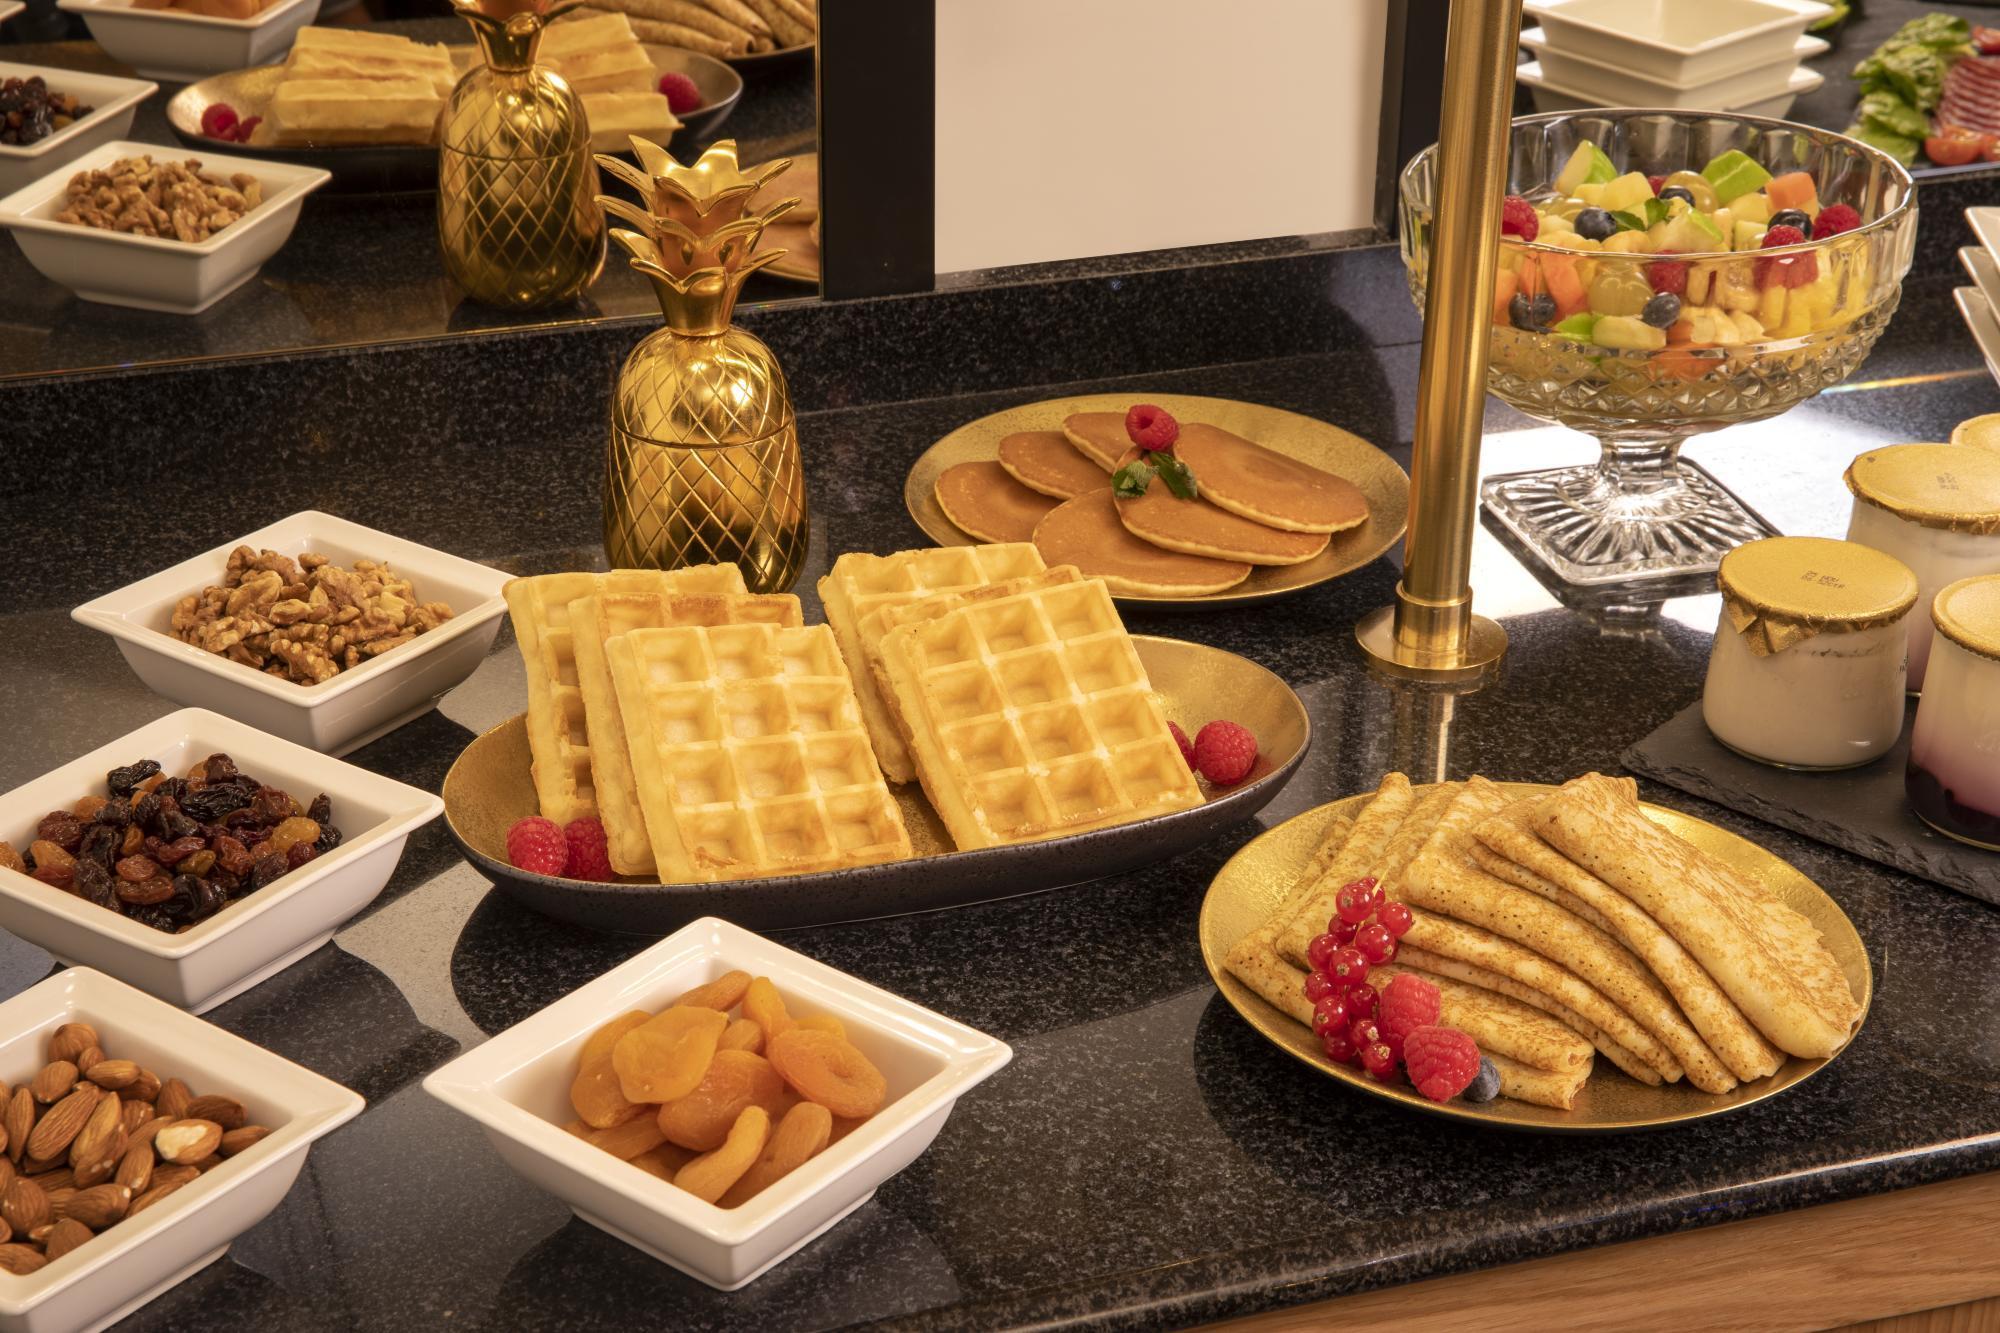 Grand Hotel Chicago buffet breakfast